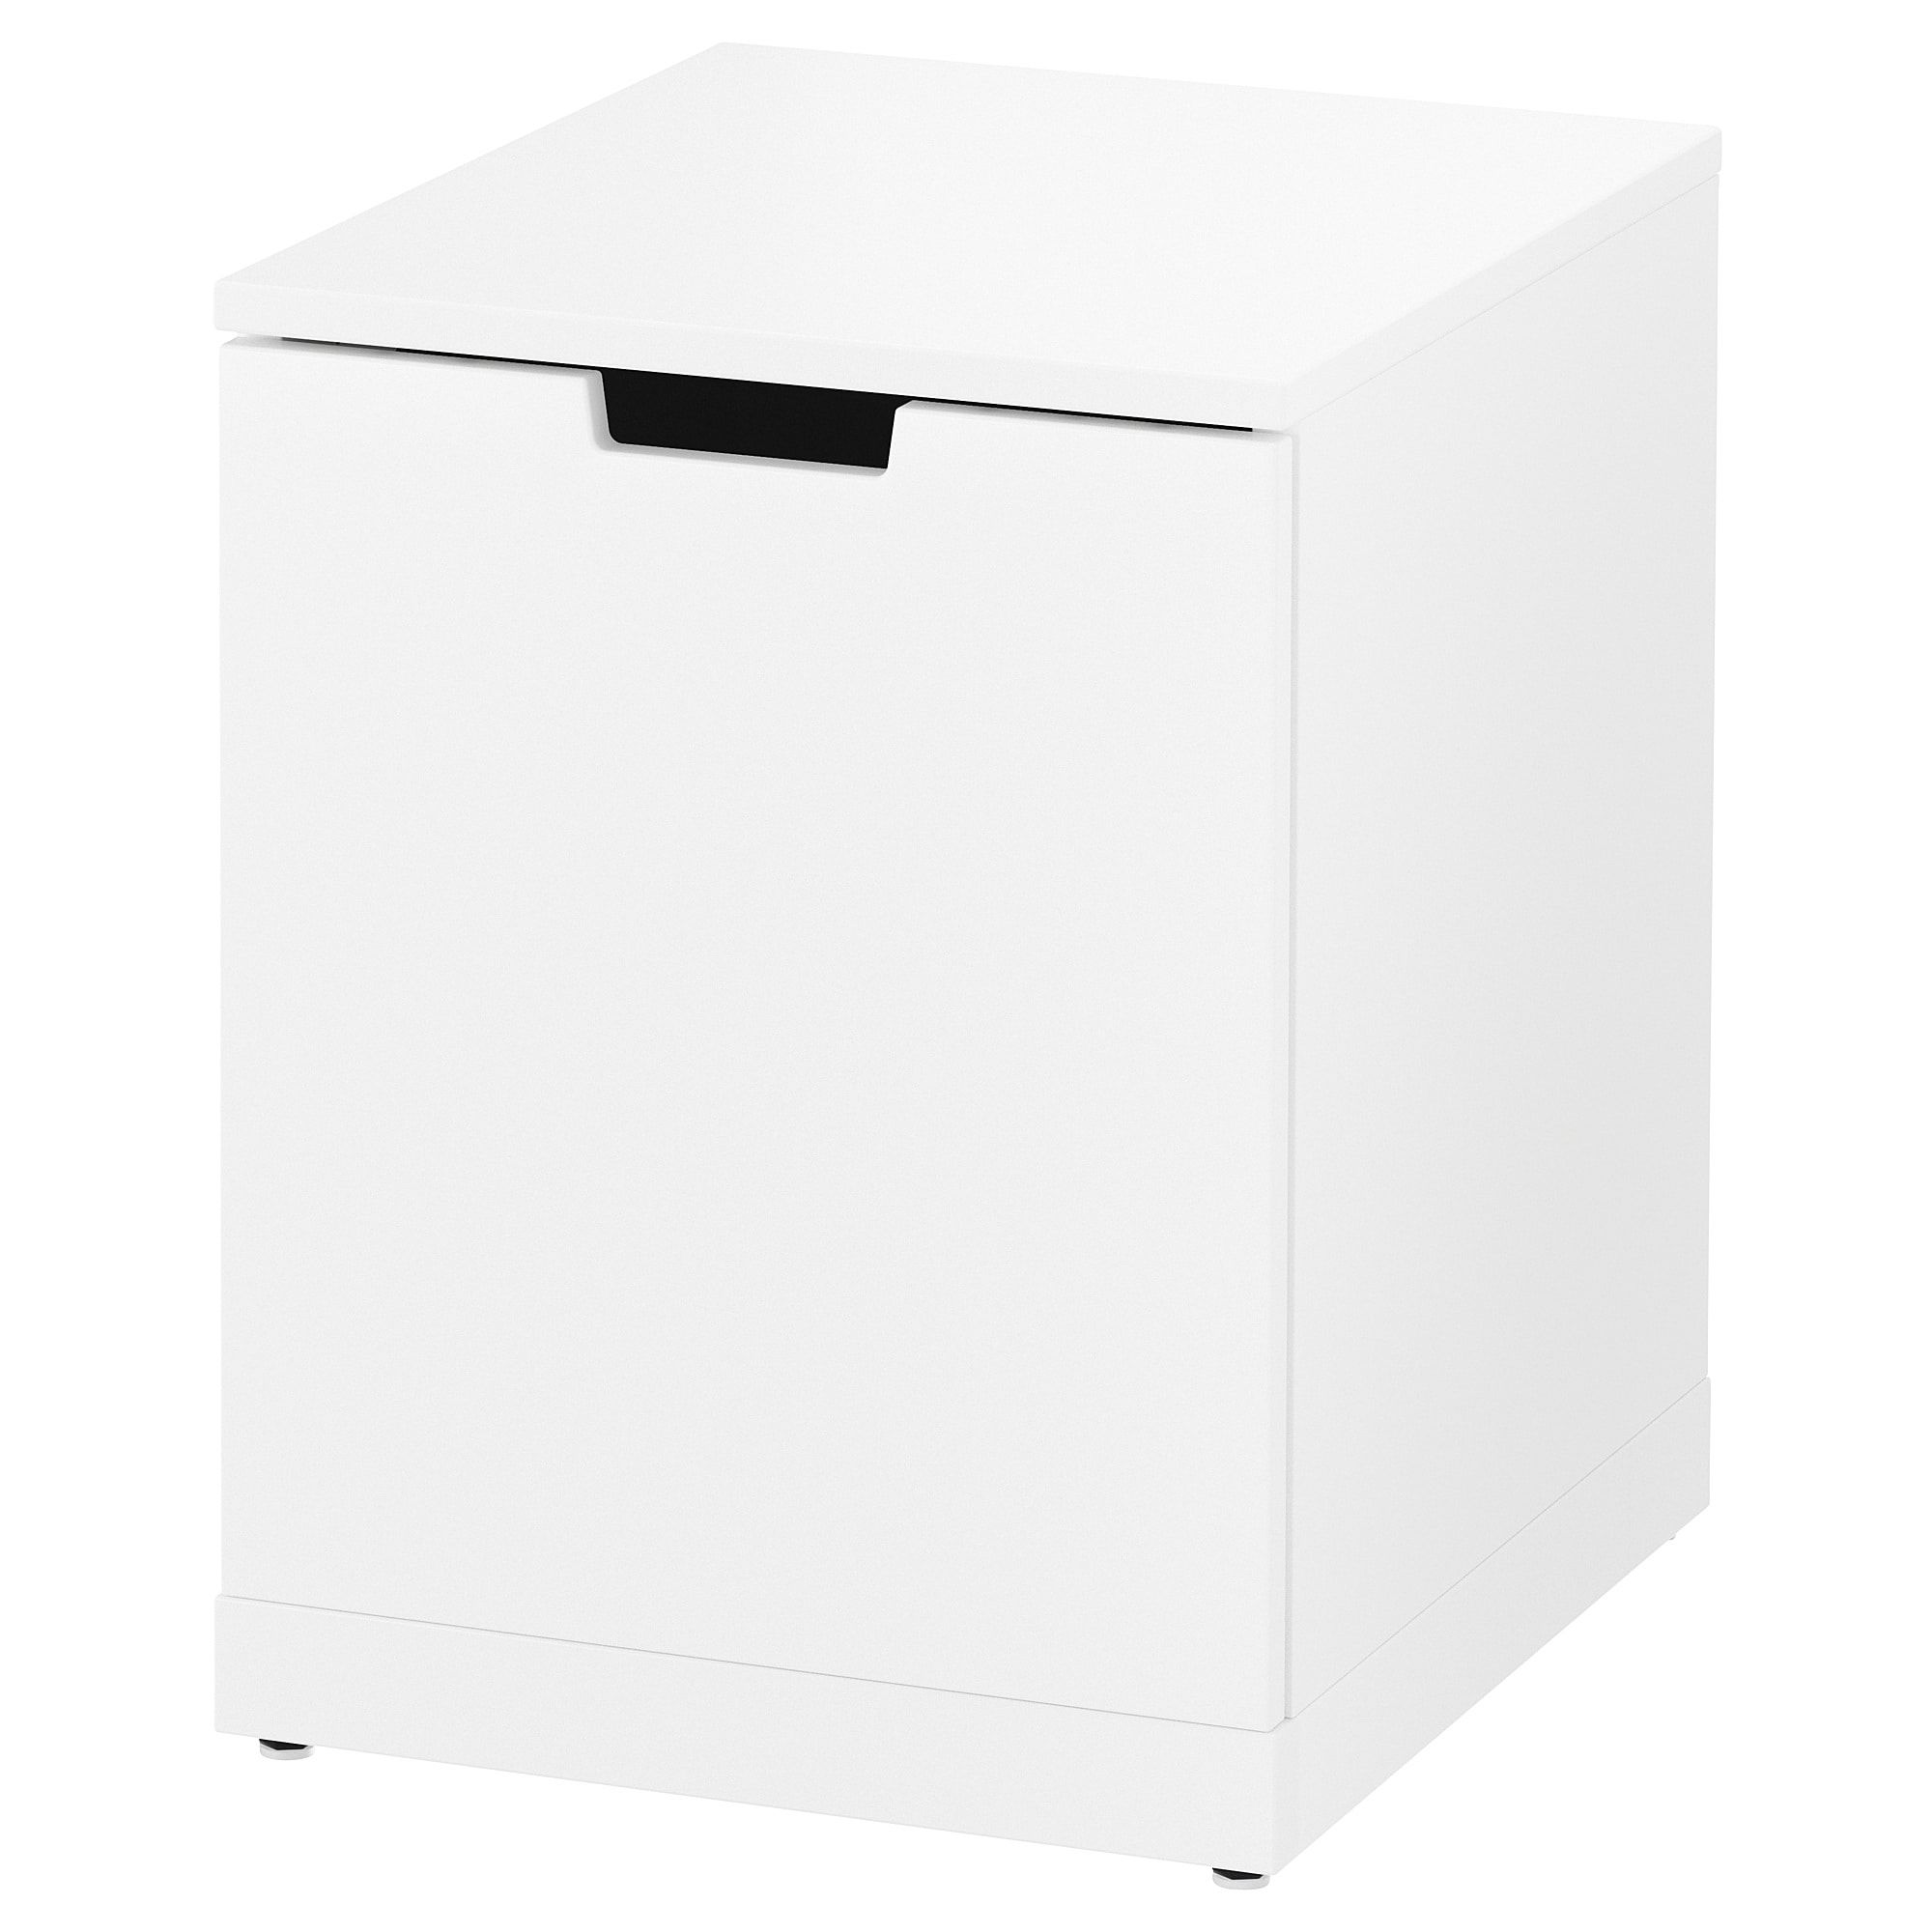 "White 15 3/4x21 1/4 "" (40x54 Cm) (With"